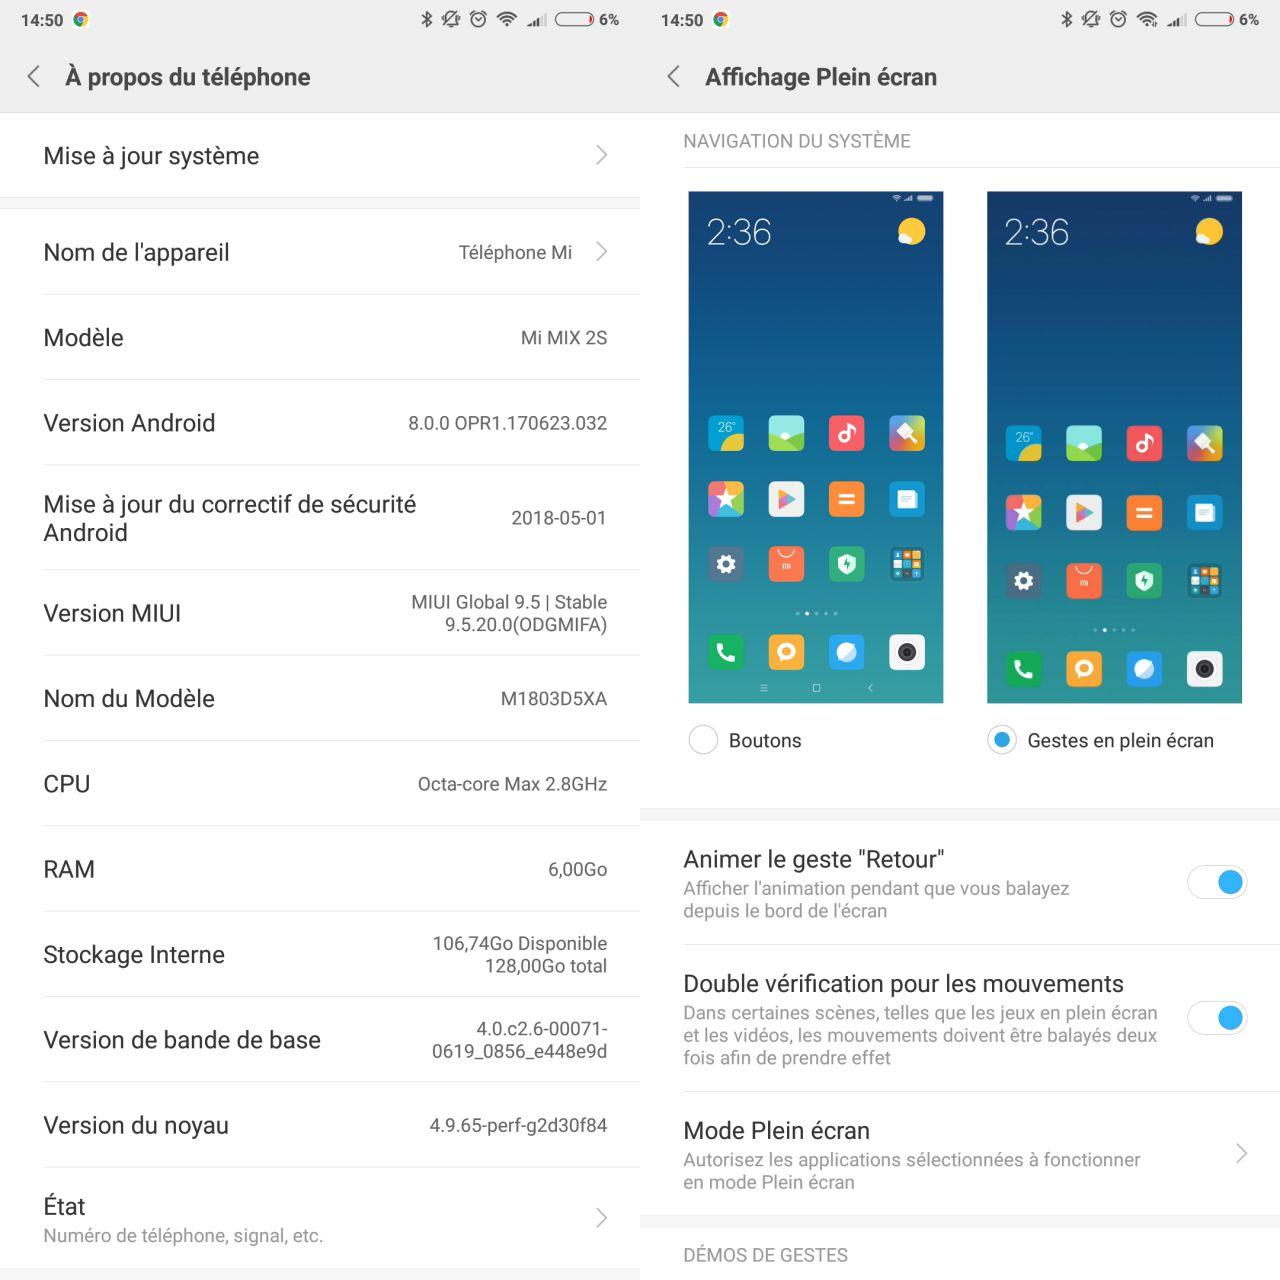 Android Oreo et MIUI 9.5 sur le Xiaomi Mi Mix 2S